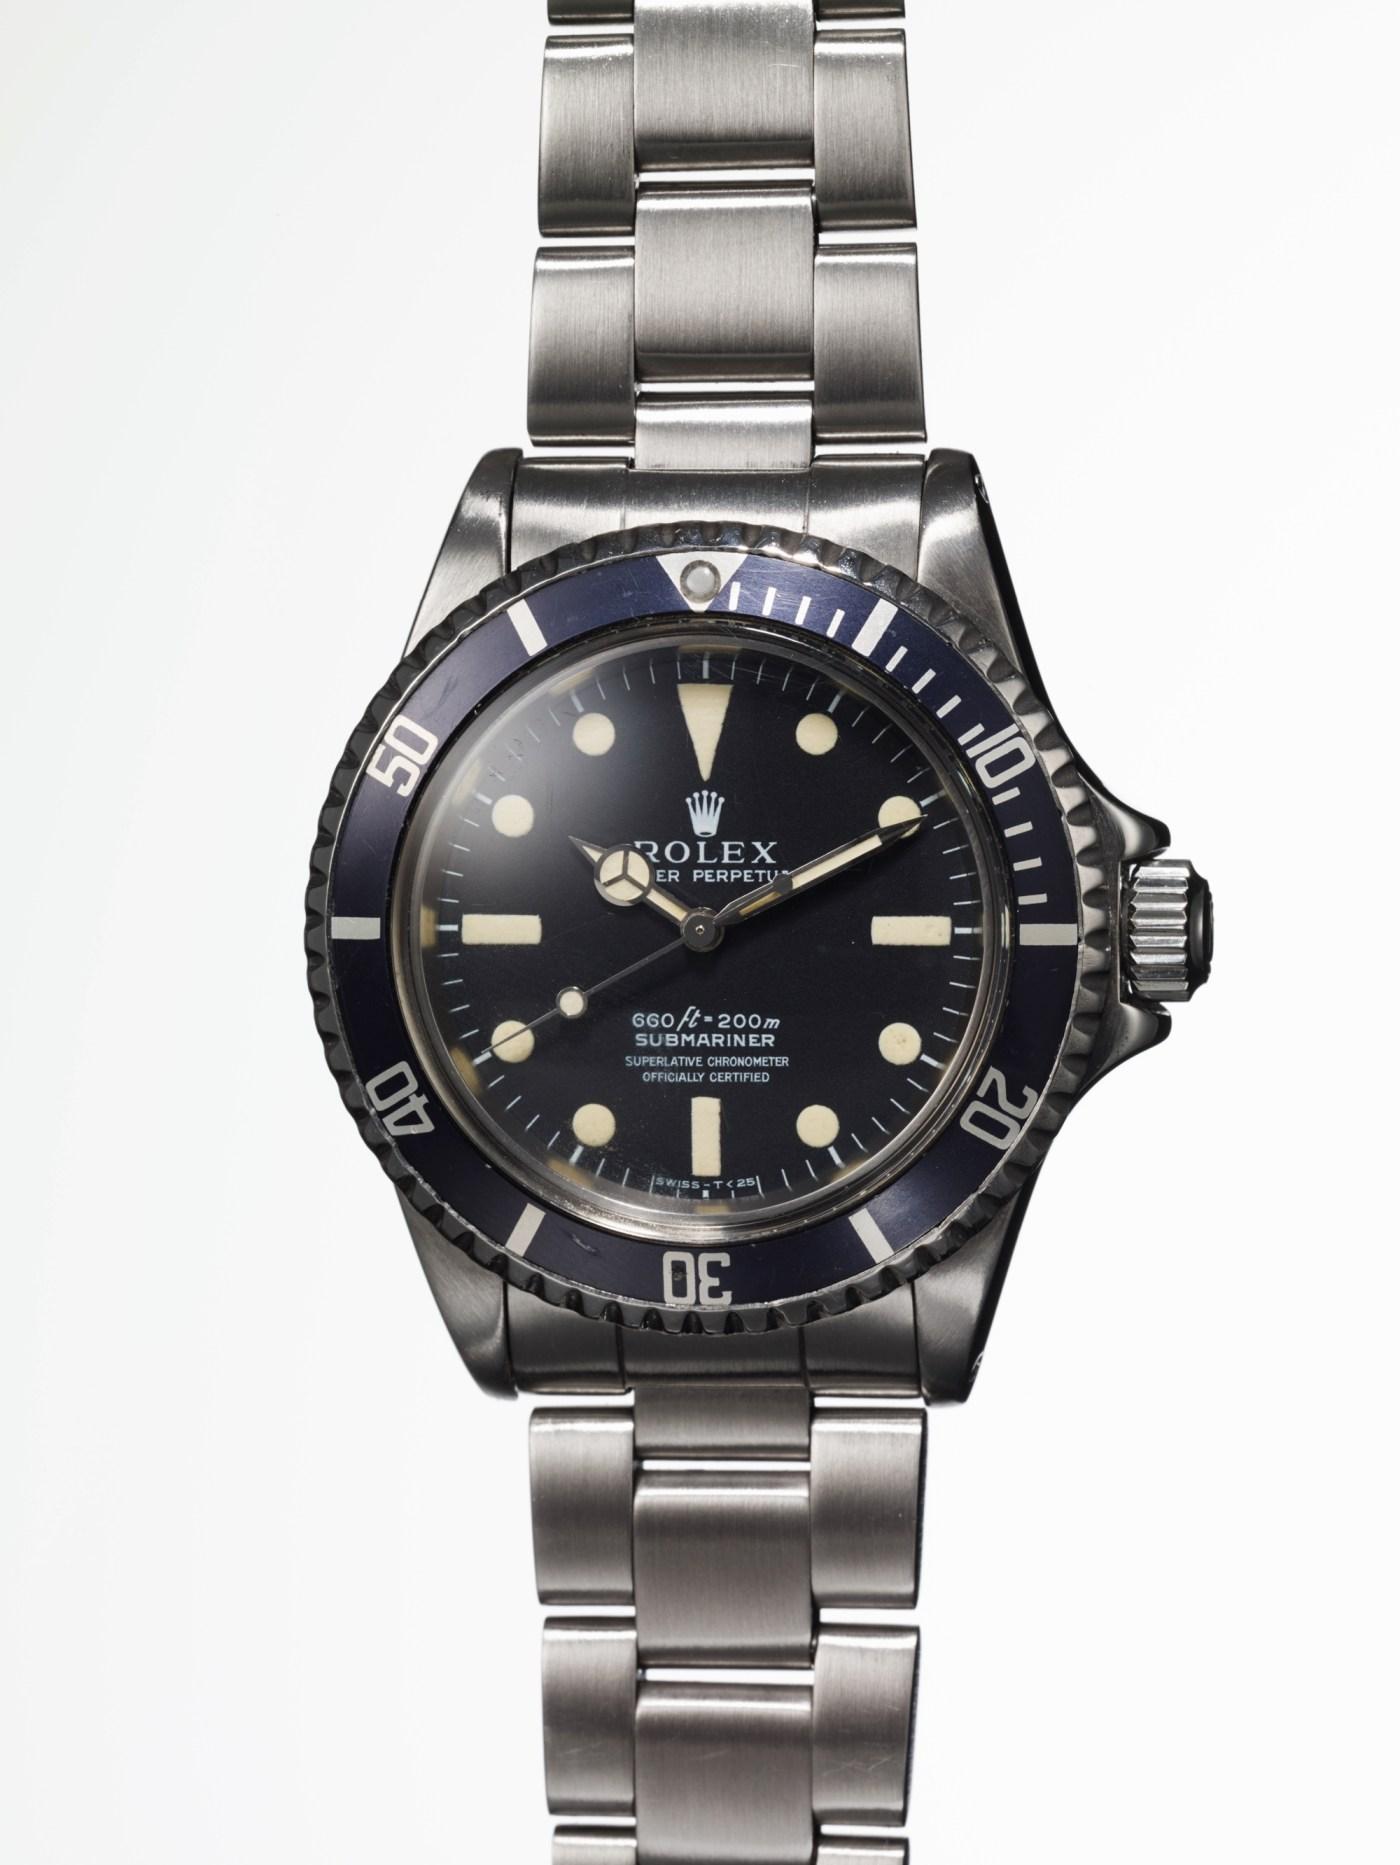 Phillips Steve Mcqueen Rolex-Submariner Ref. 5513 front